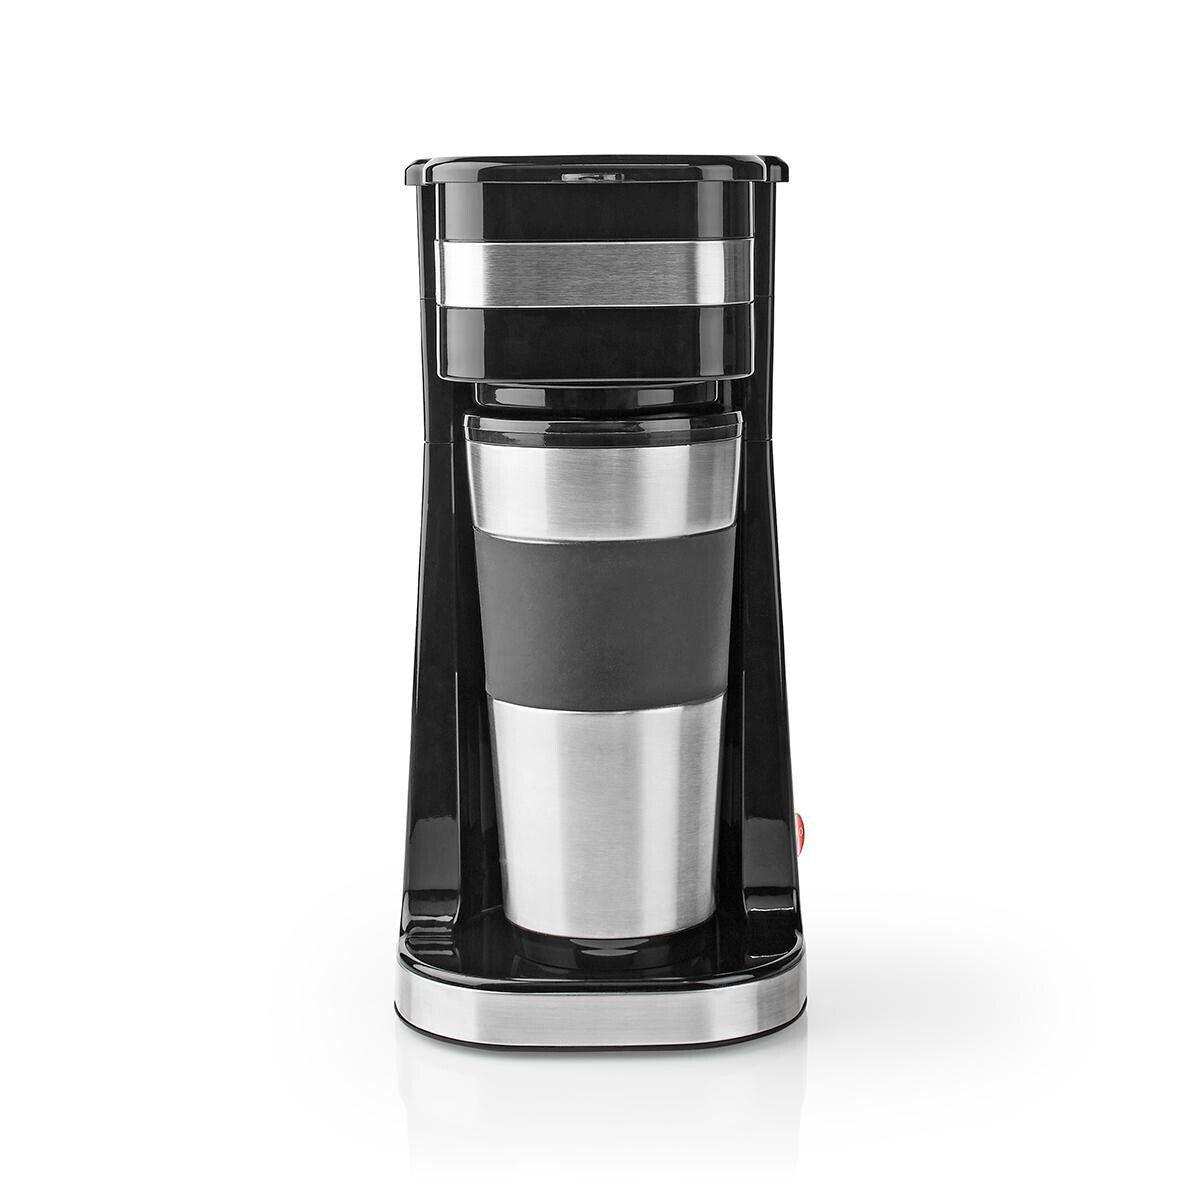 Nedis 1 Tassen Kaffeemaschine mit Thermobecher 0,42l Mini Filter kaffeemaschine